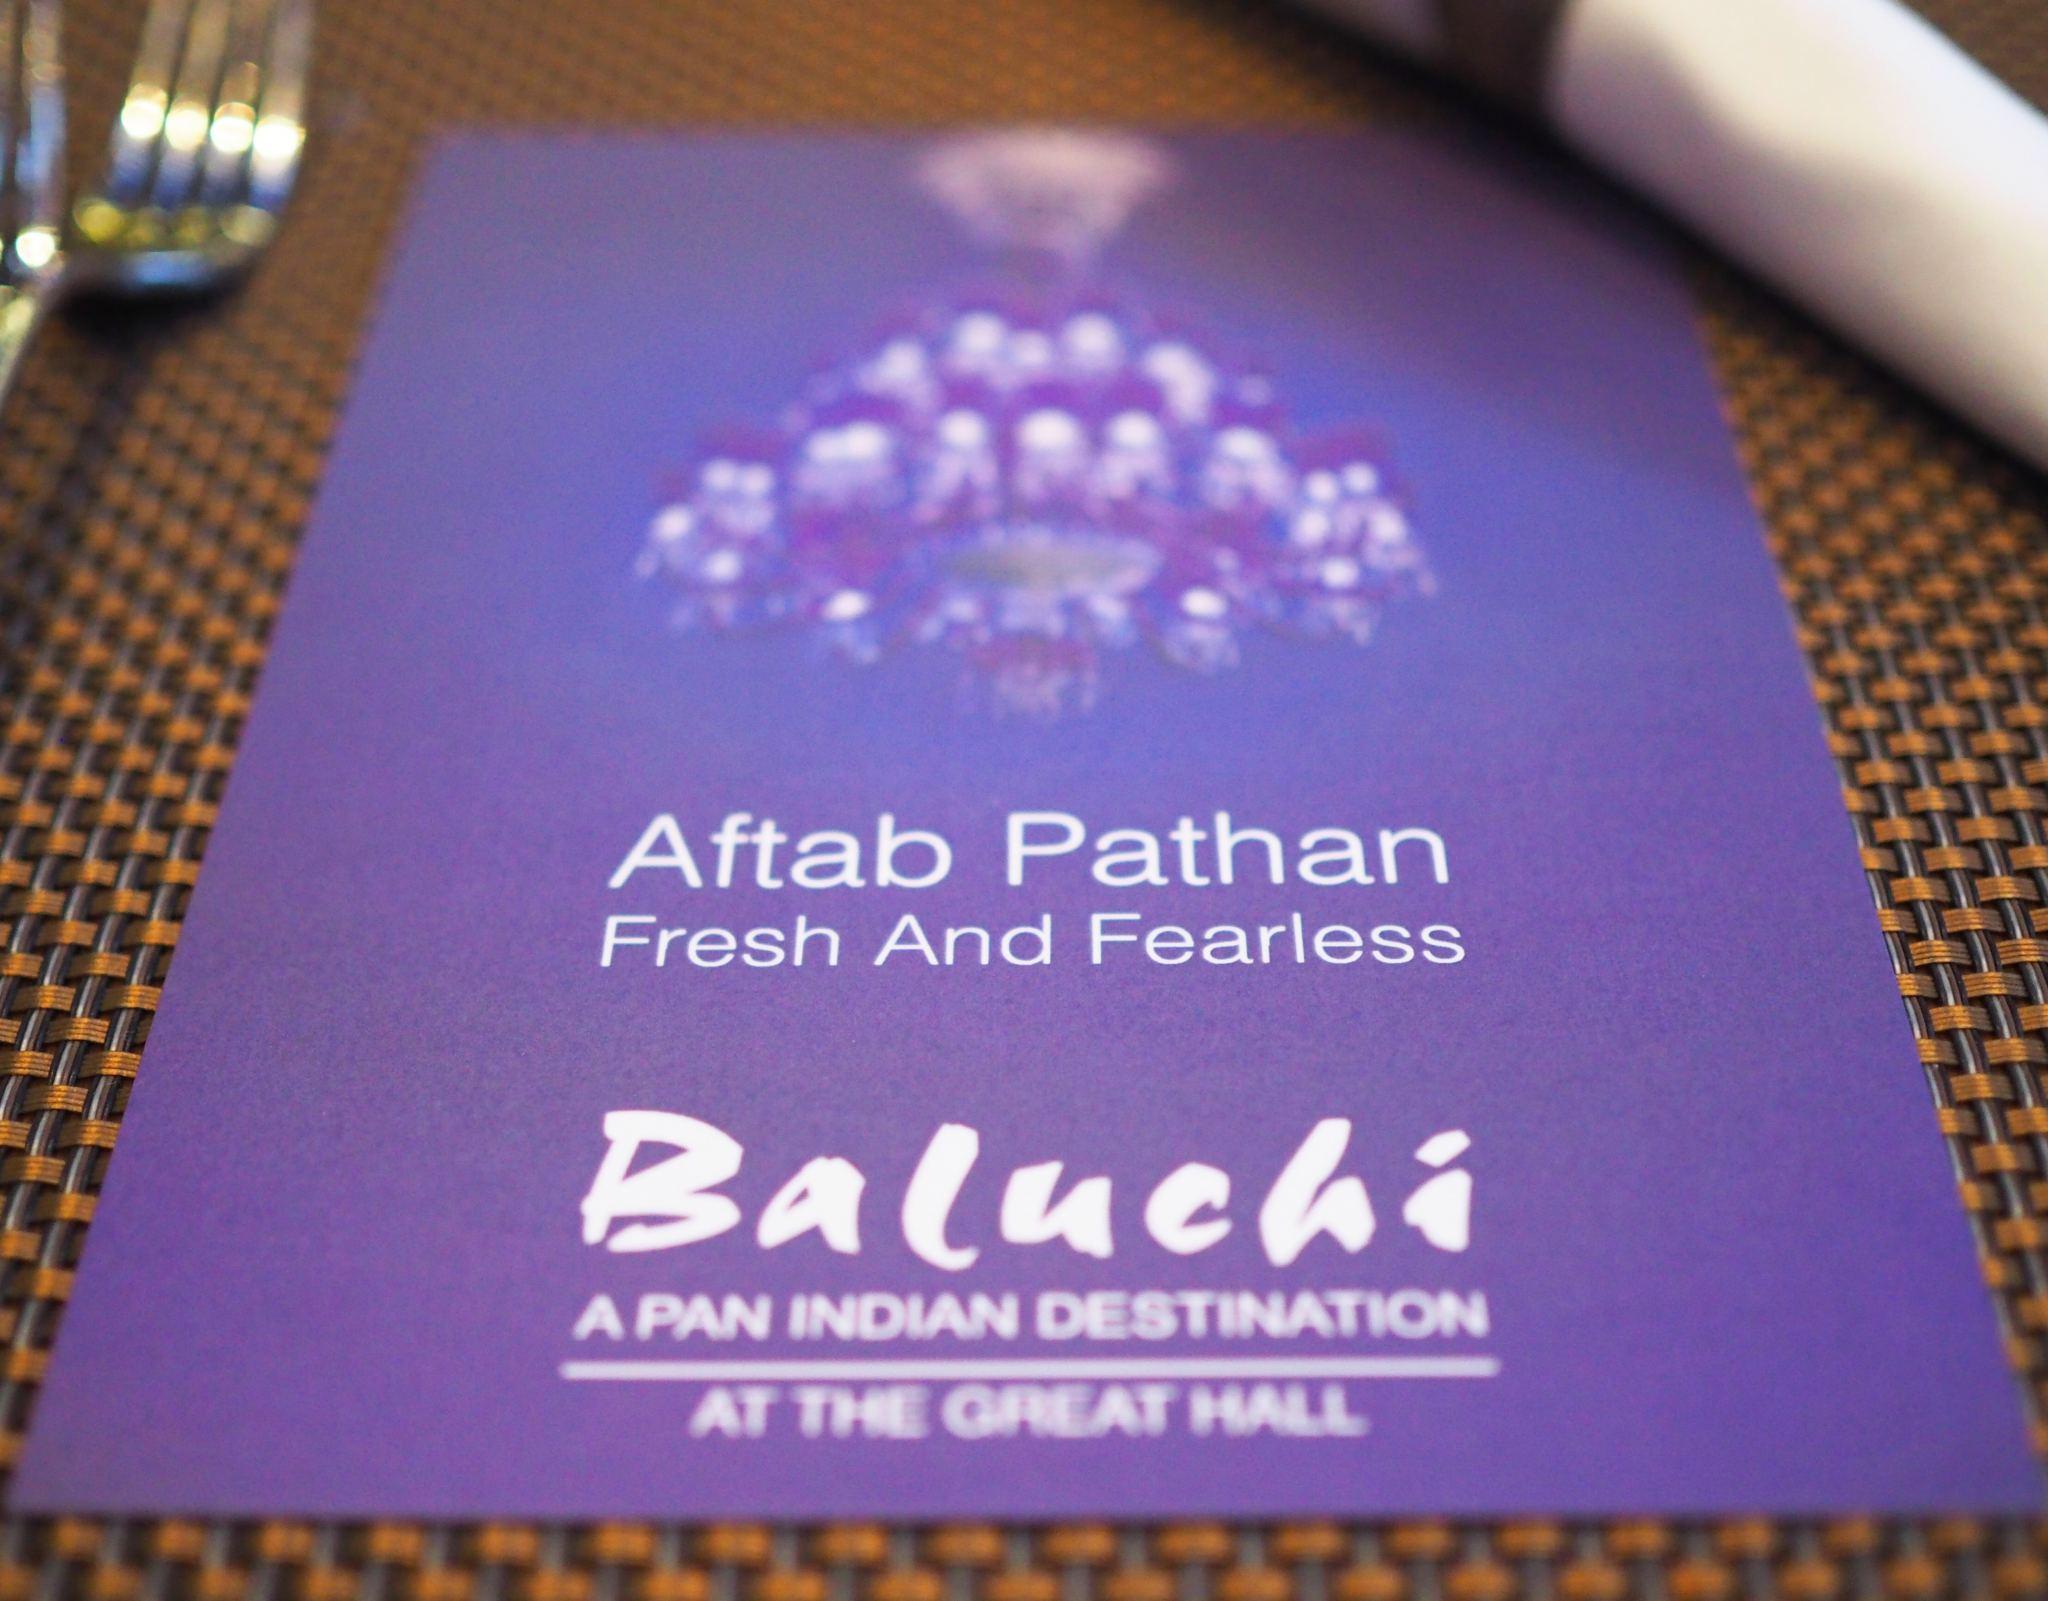 Baluchi, LaLit London